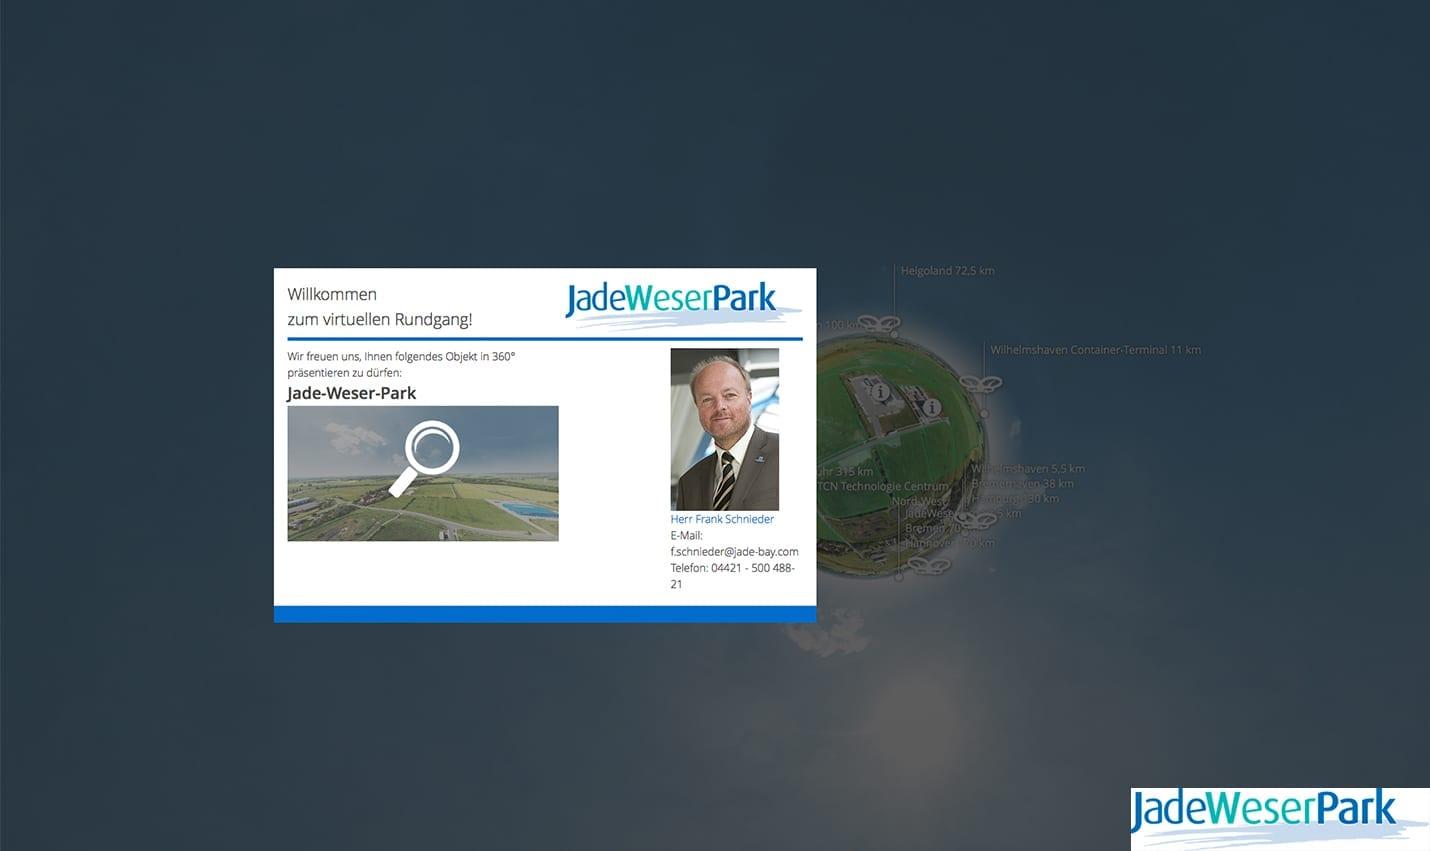 Virtuelle Tour Jade-Weser Park 360 Willkommensdialog